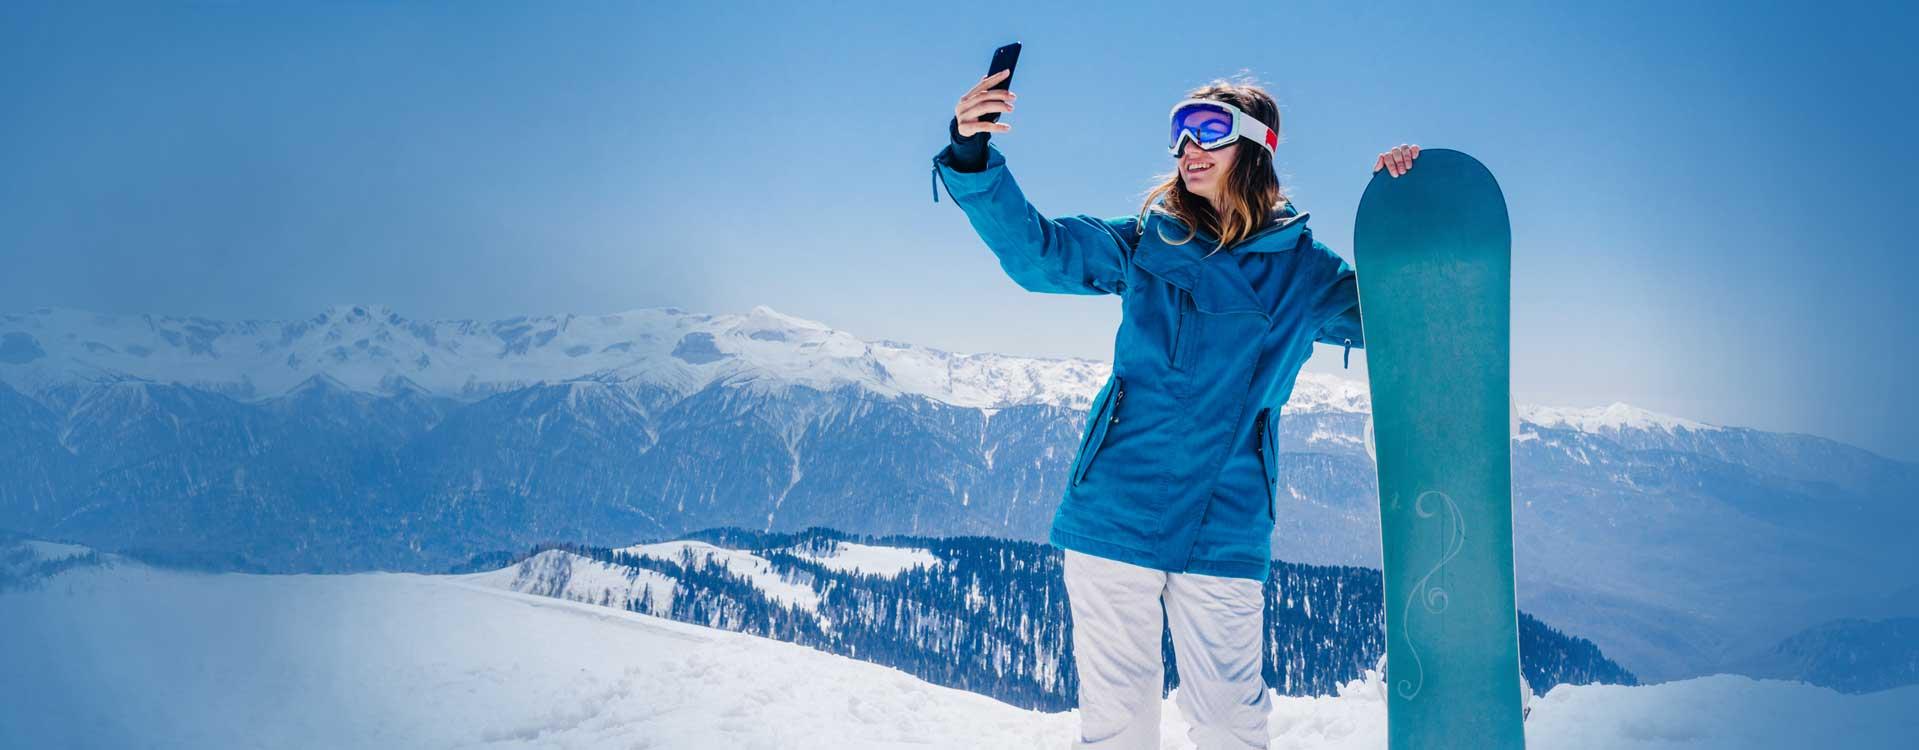 Home-banner_young-woman-snowbaord-mobile_desktop_1919x750